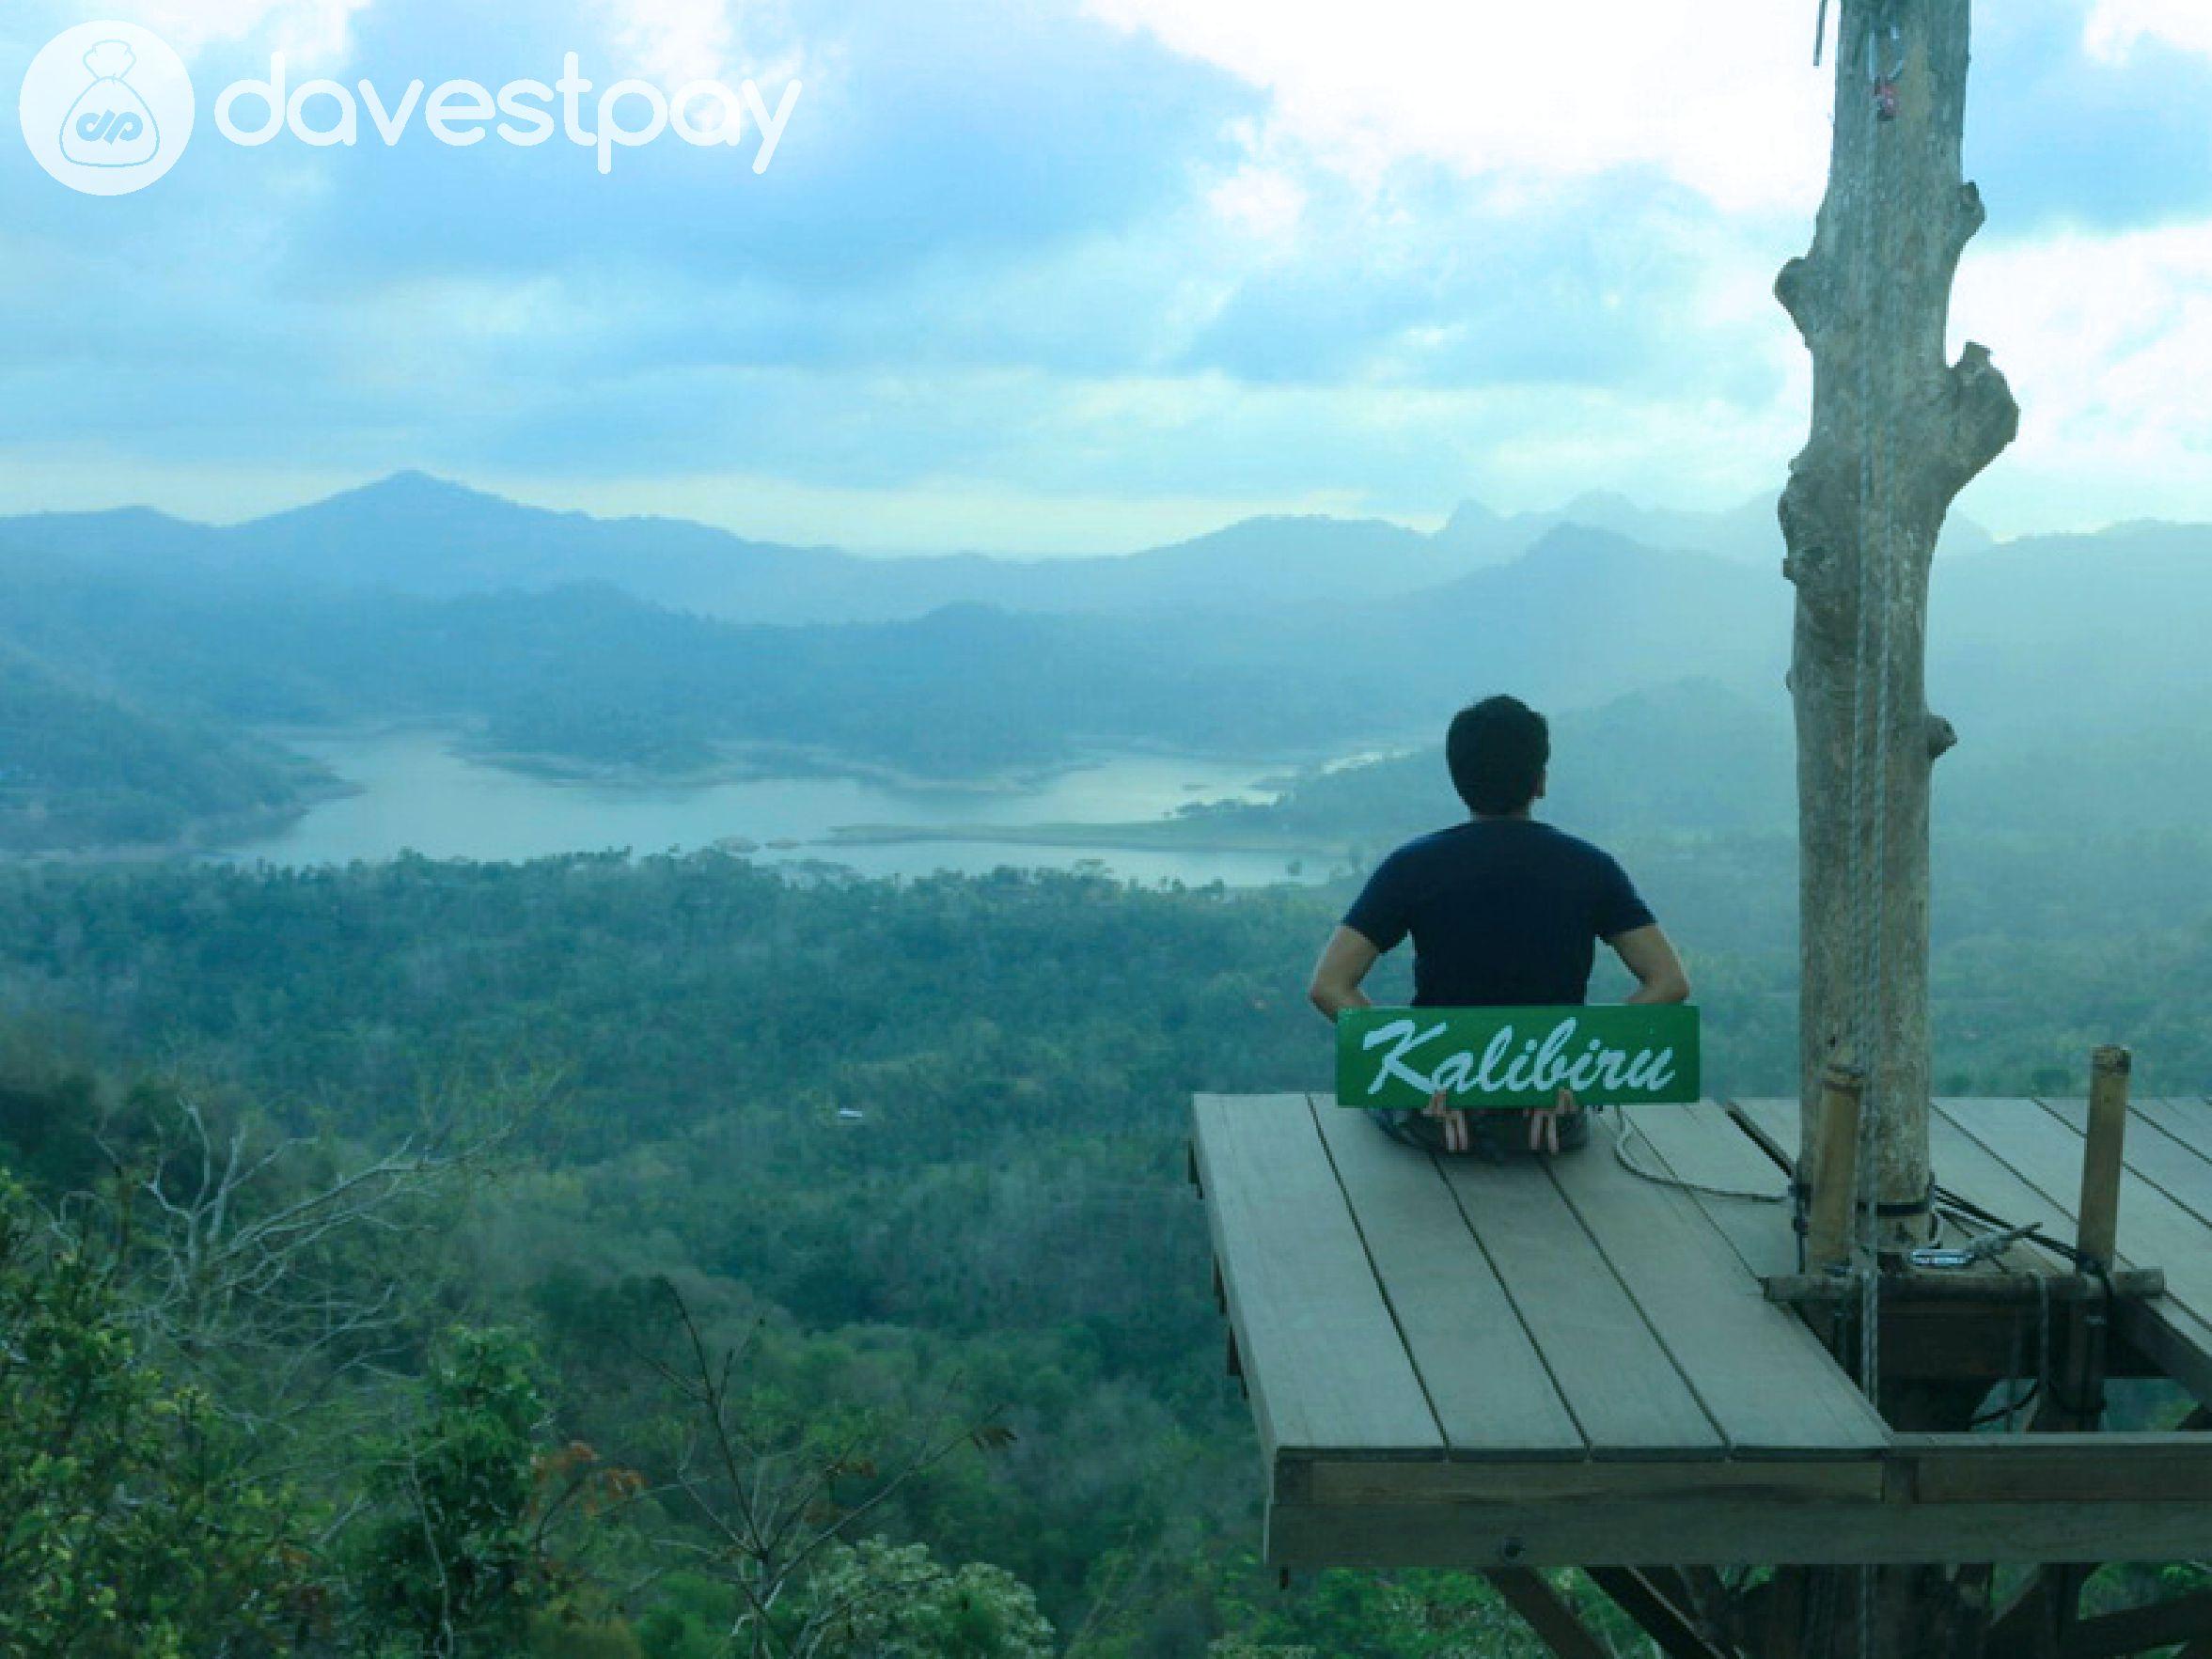 Cari Tempat Liburan untuk Akhir Pekan? Yogyakarta Punya Kalibiru !